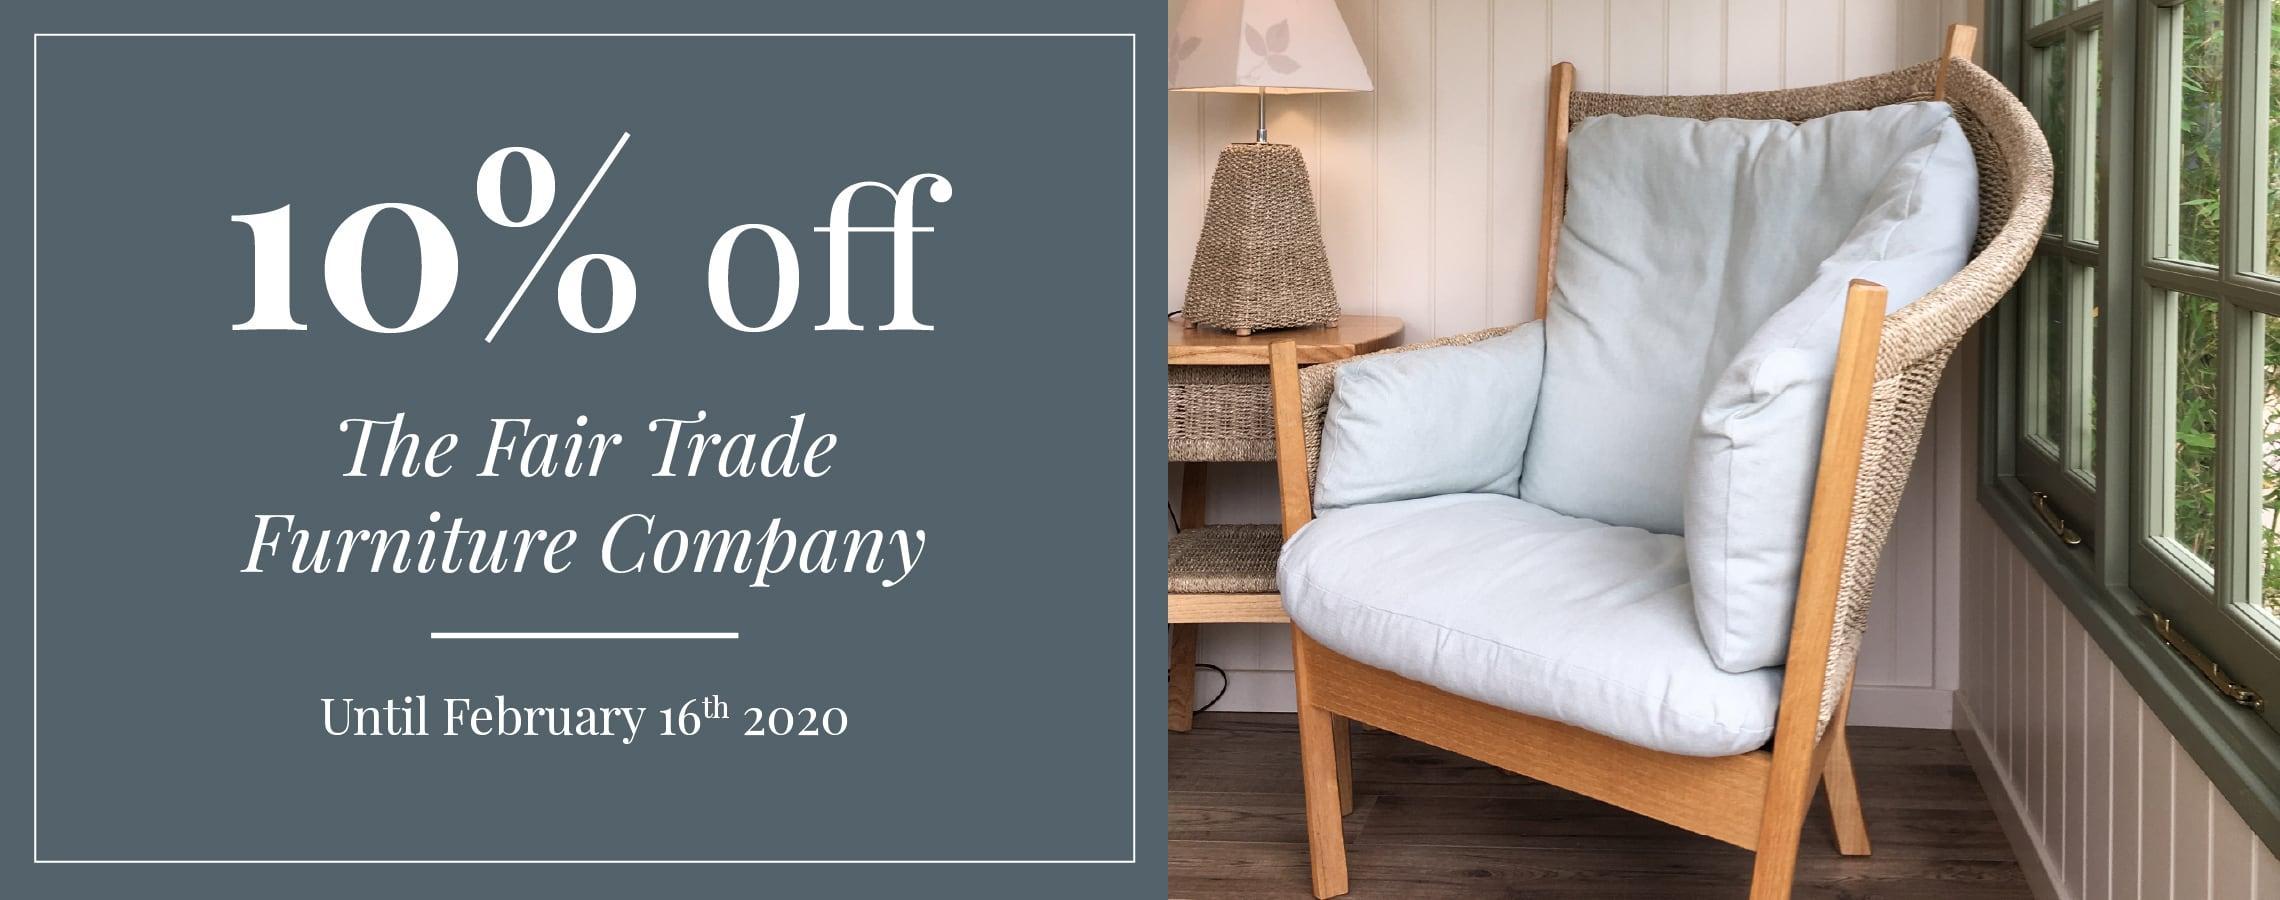 10% off The Fair-trade Furniture Company Sale